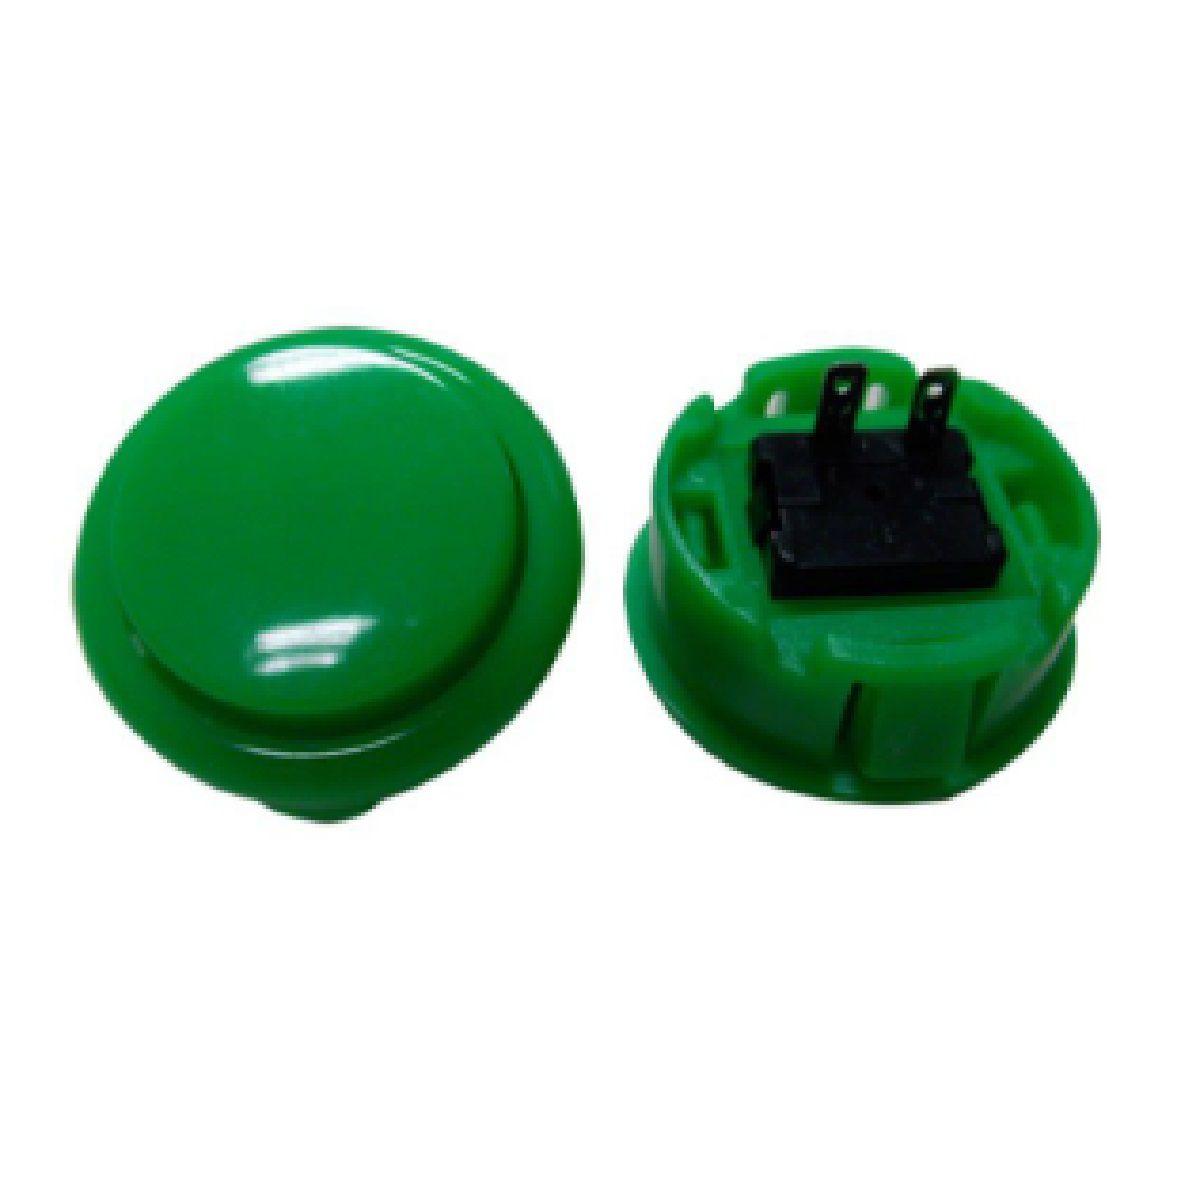 Botão Arcade Fliperama Alta Performance Tipo Sanwa (conector 2.8mm) Verde